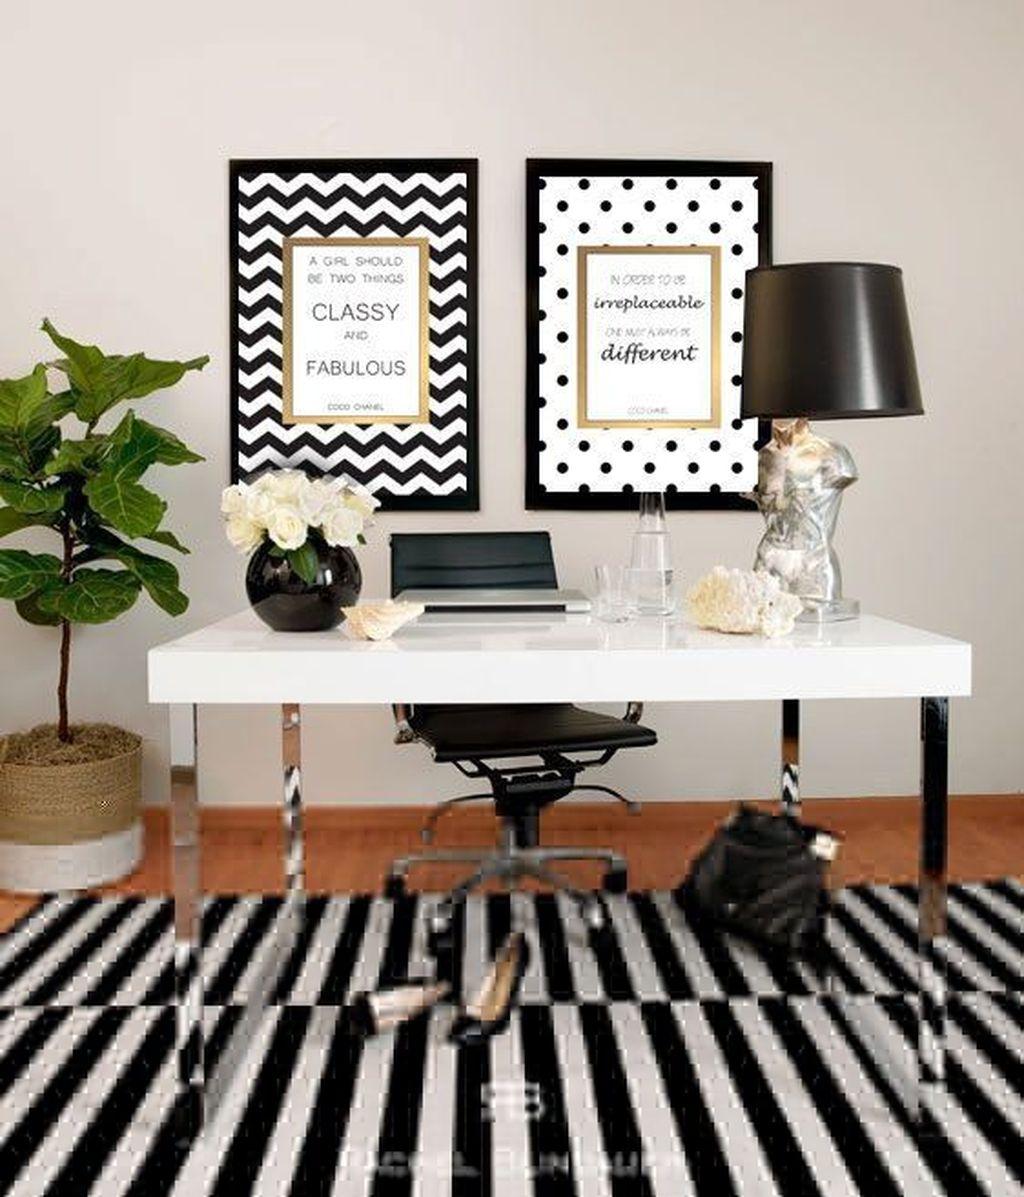 The Best Office Artwork Design Ideas 04